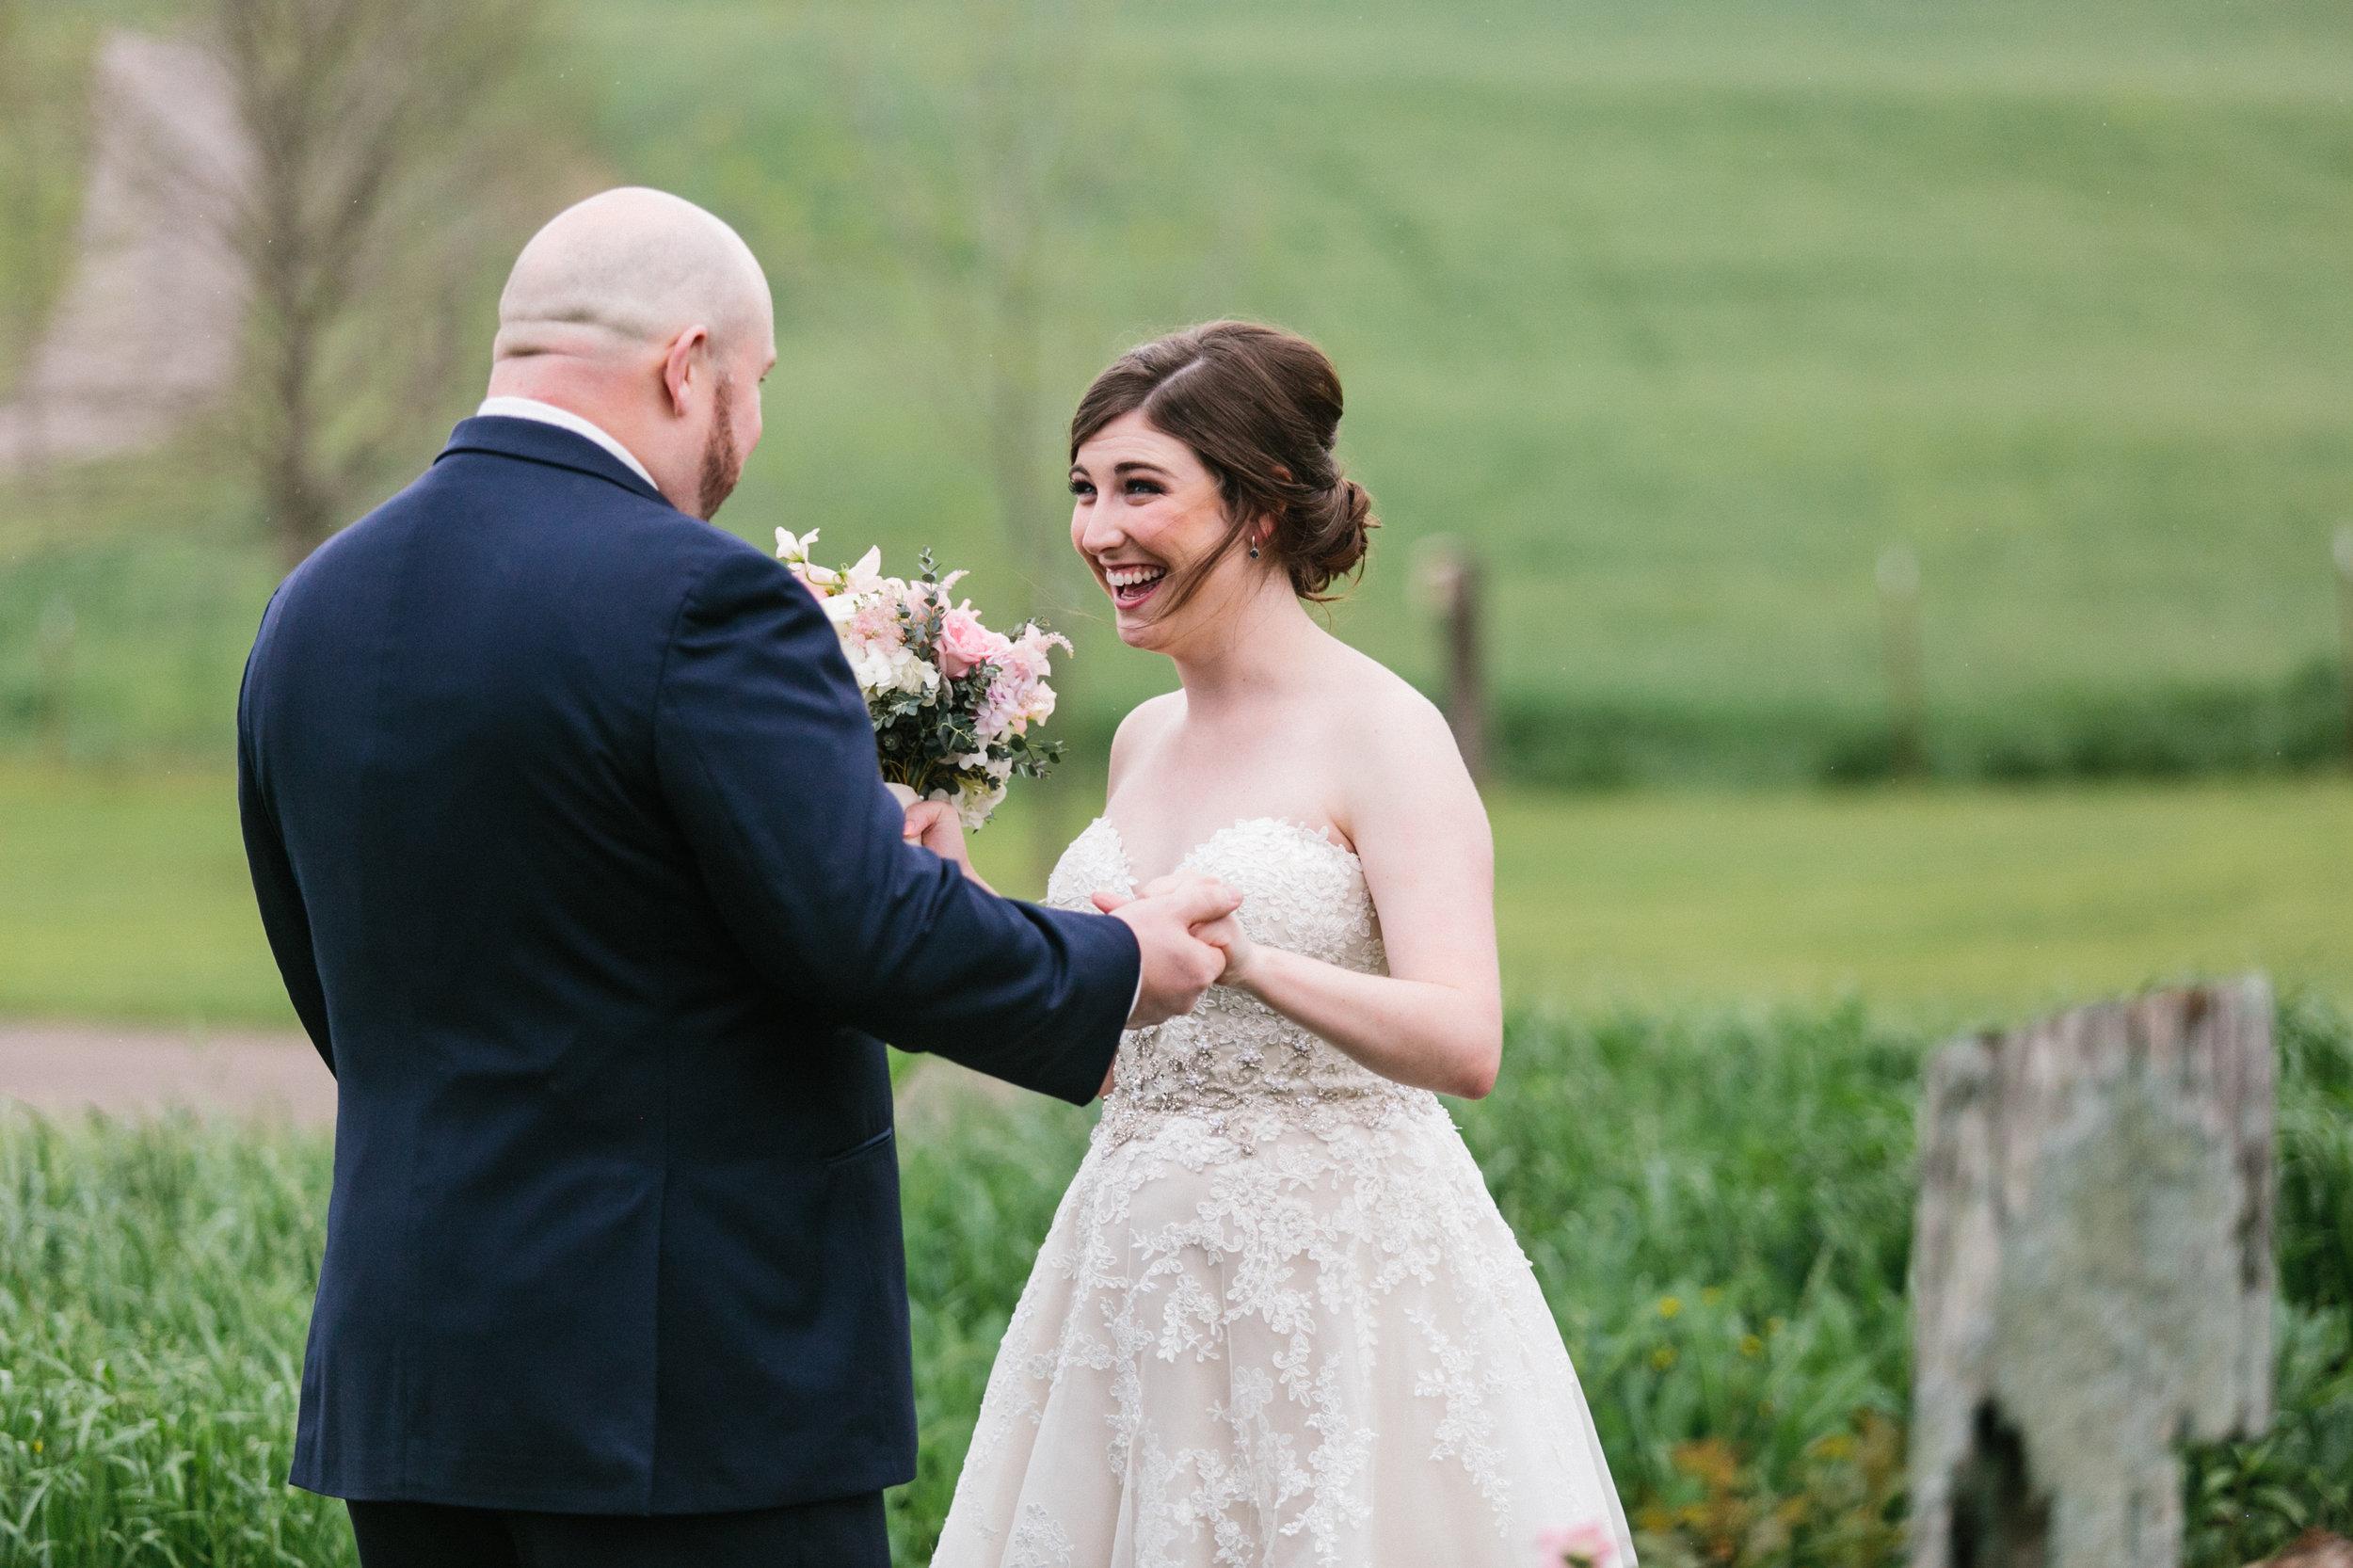 Lydia_johnathan_Wedding_Abigail_Malone_Photography-179.jpg